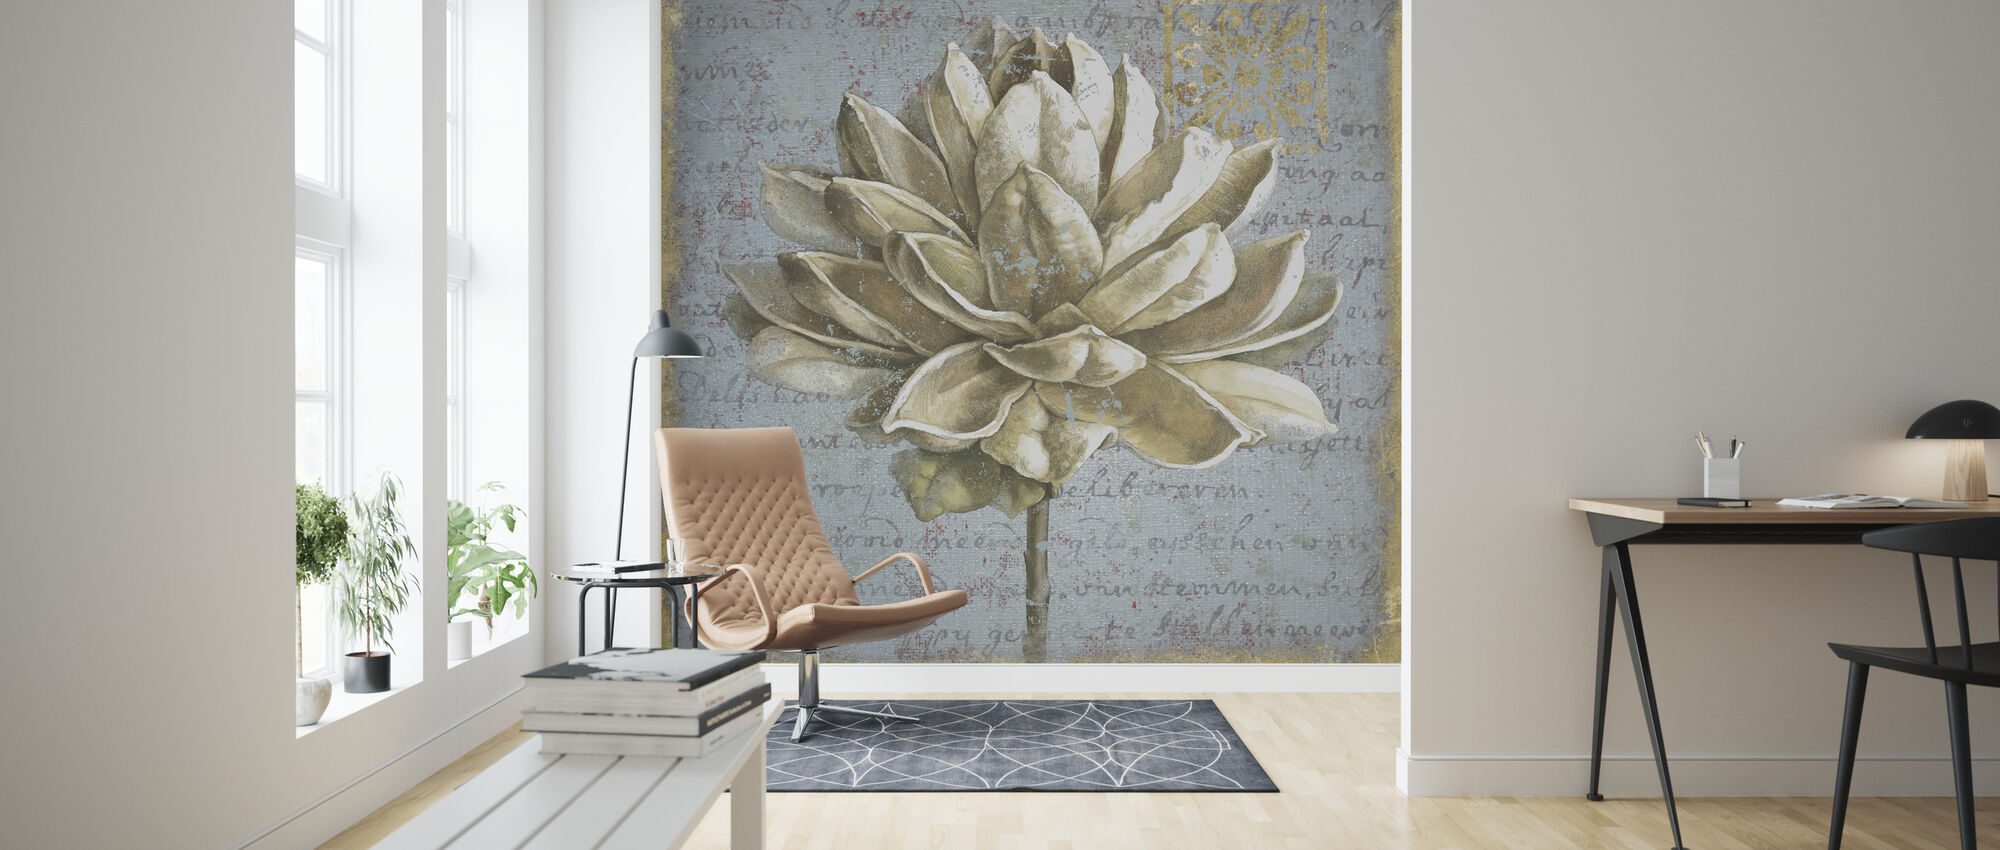 Seed Pod on Text I - Wallpaper - Living Room